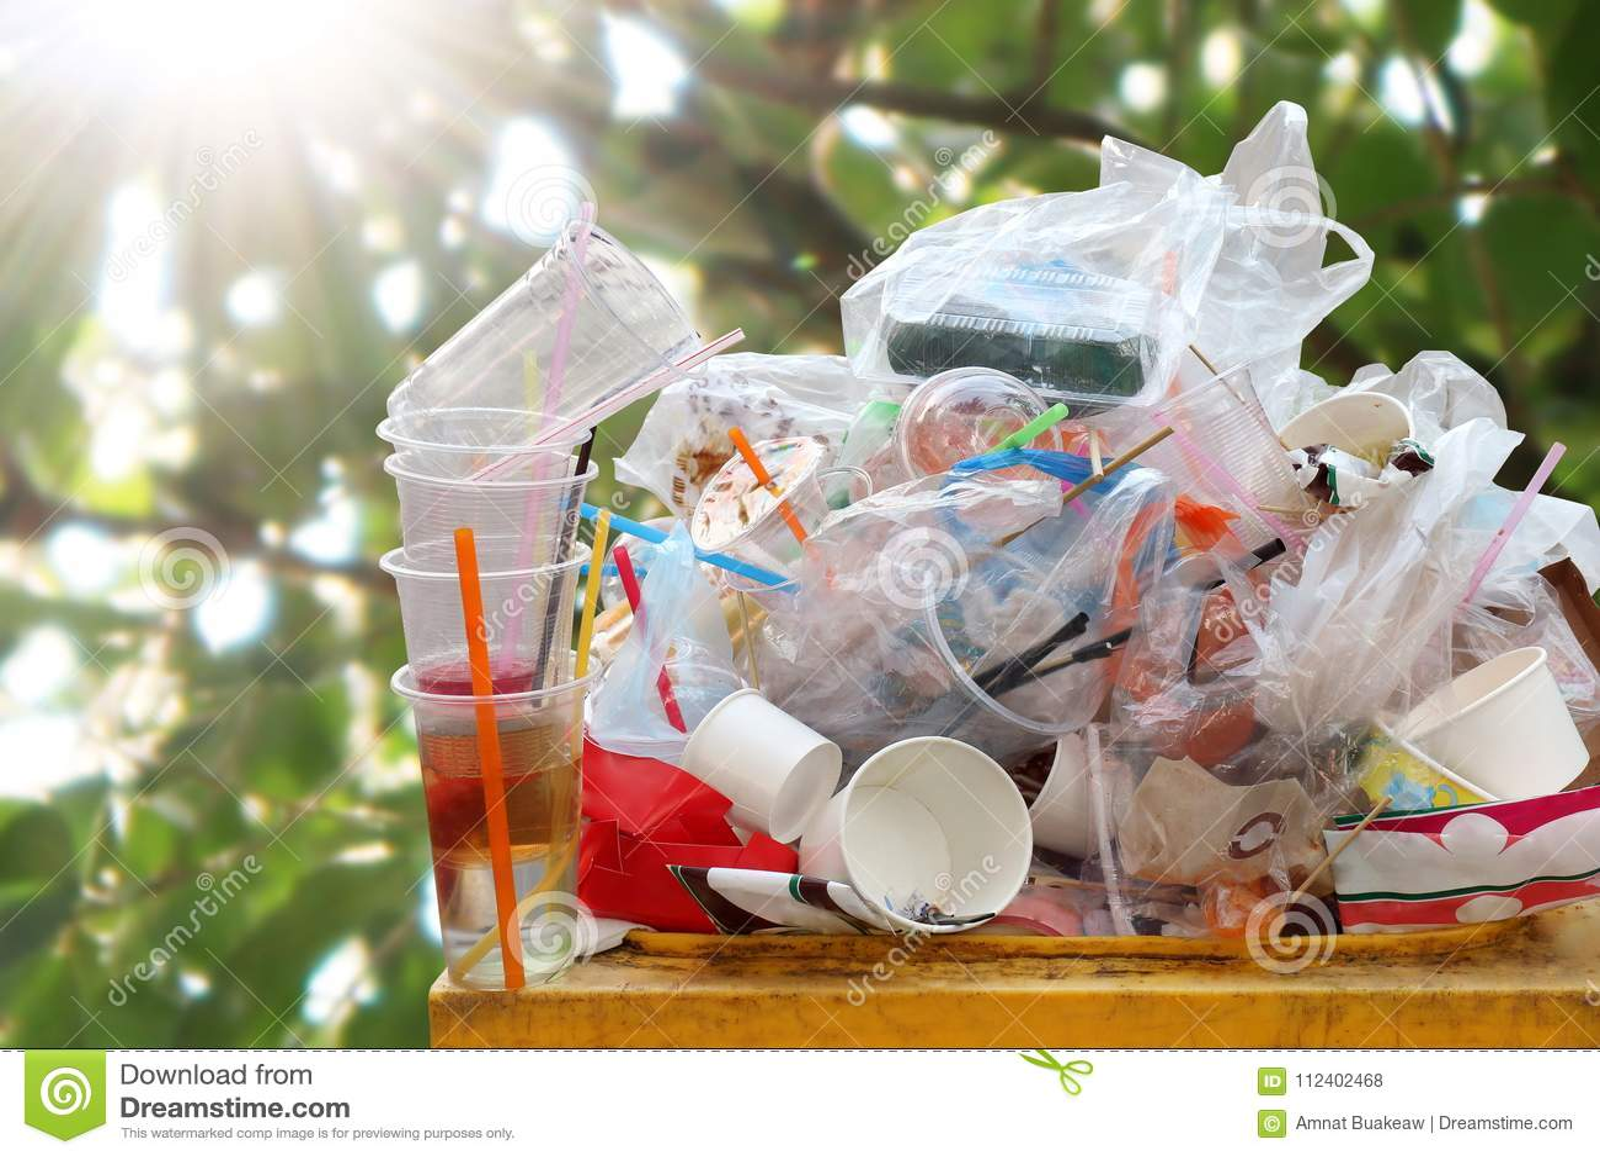 Garbage many close-up on Trash full of trash bin, Plastic bag waste Lots of junk on nature tree sunshine background